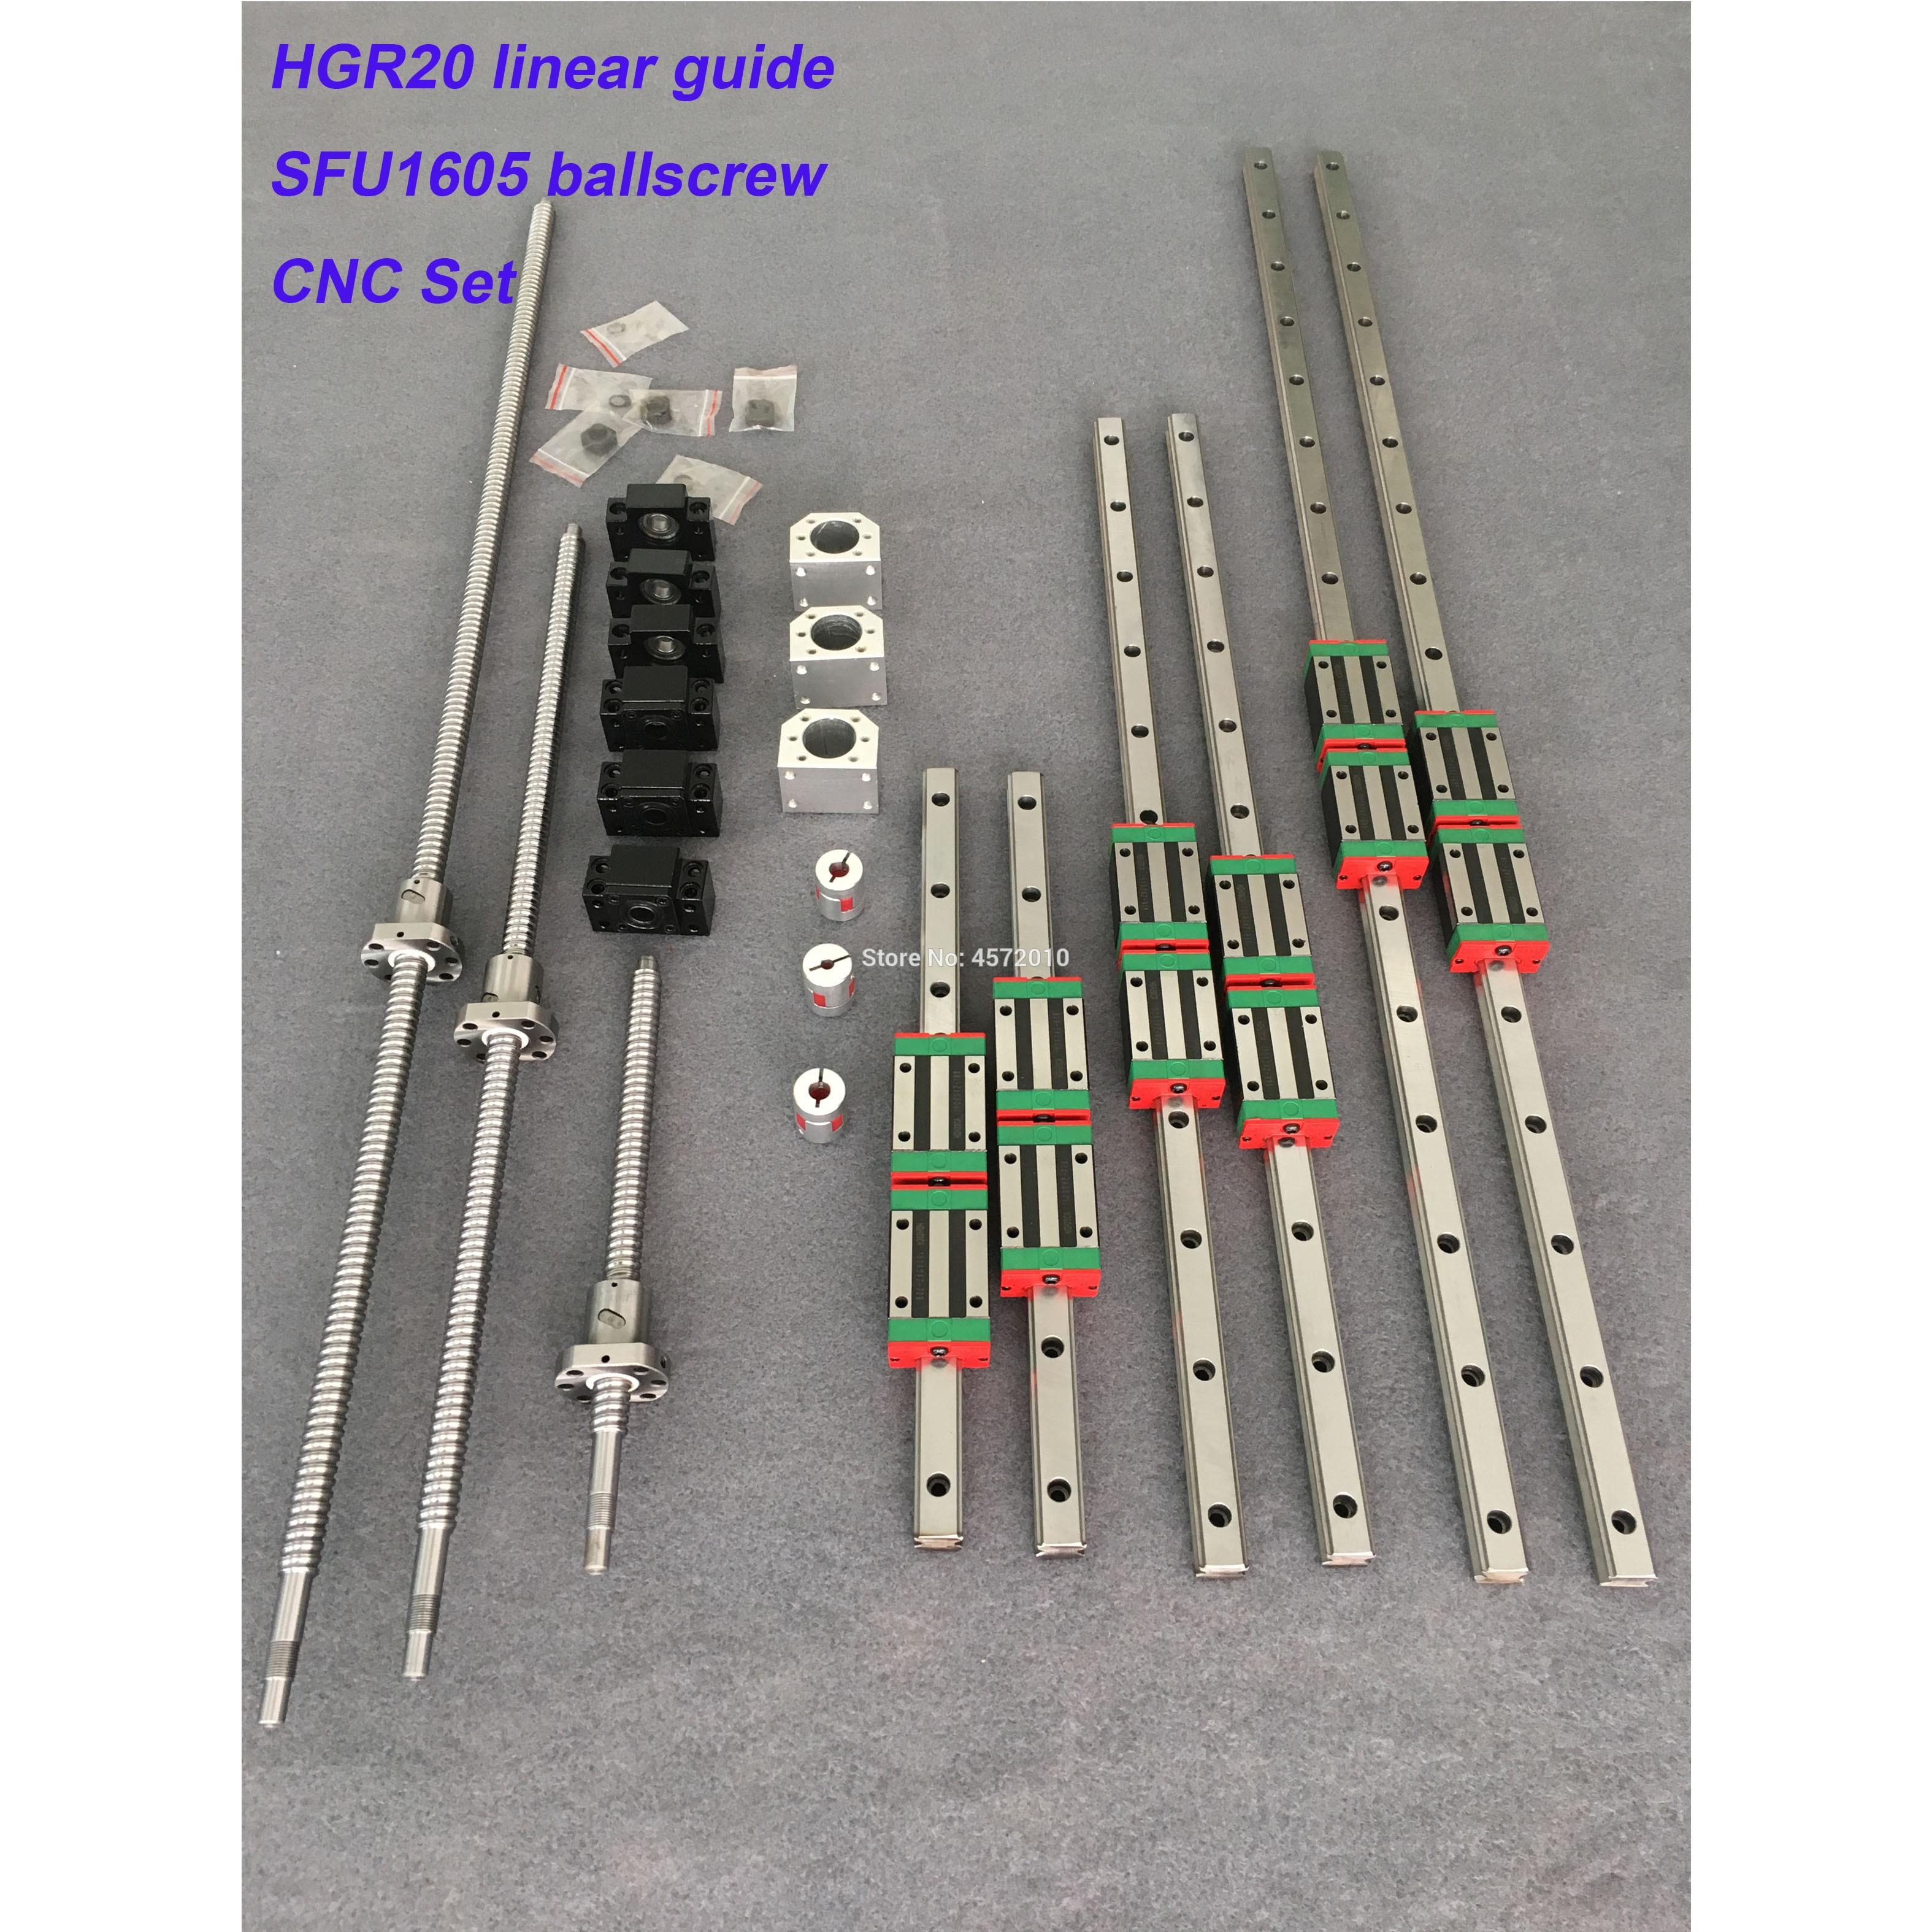 RU Delivery Ballscrew HB 20 Square Linear guide rail 6 set HB20 400 700 1000mm SFU1605